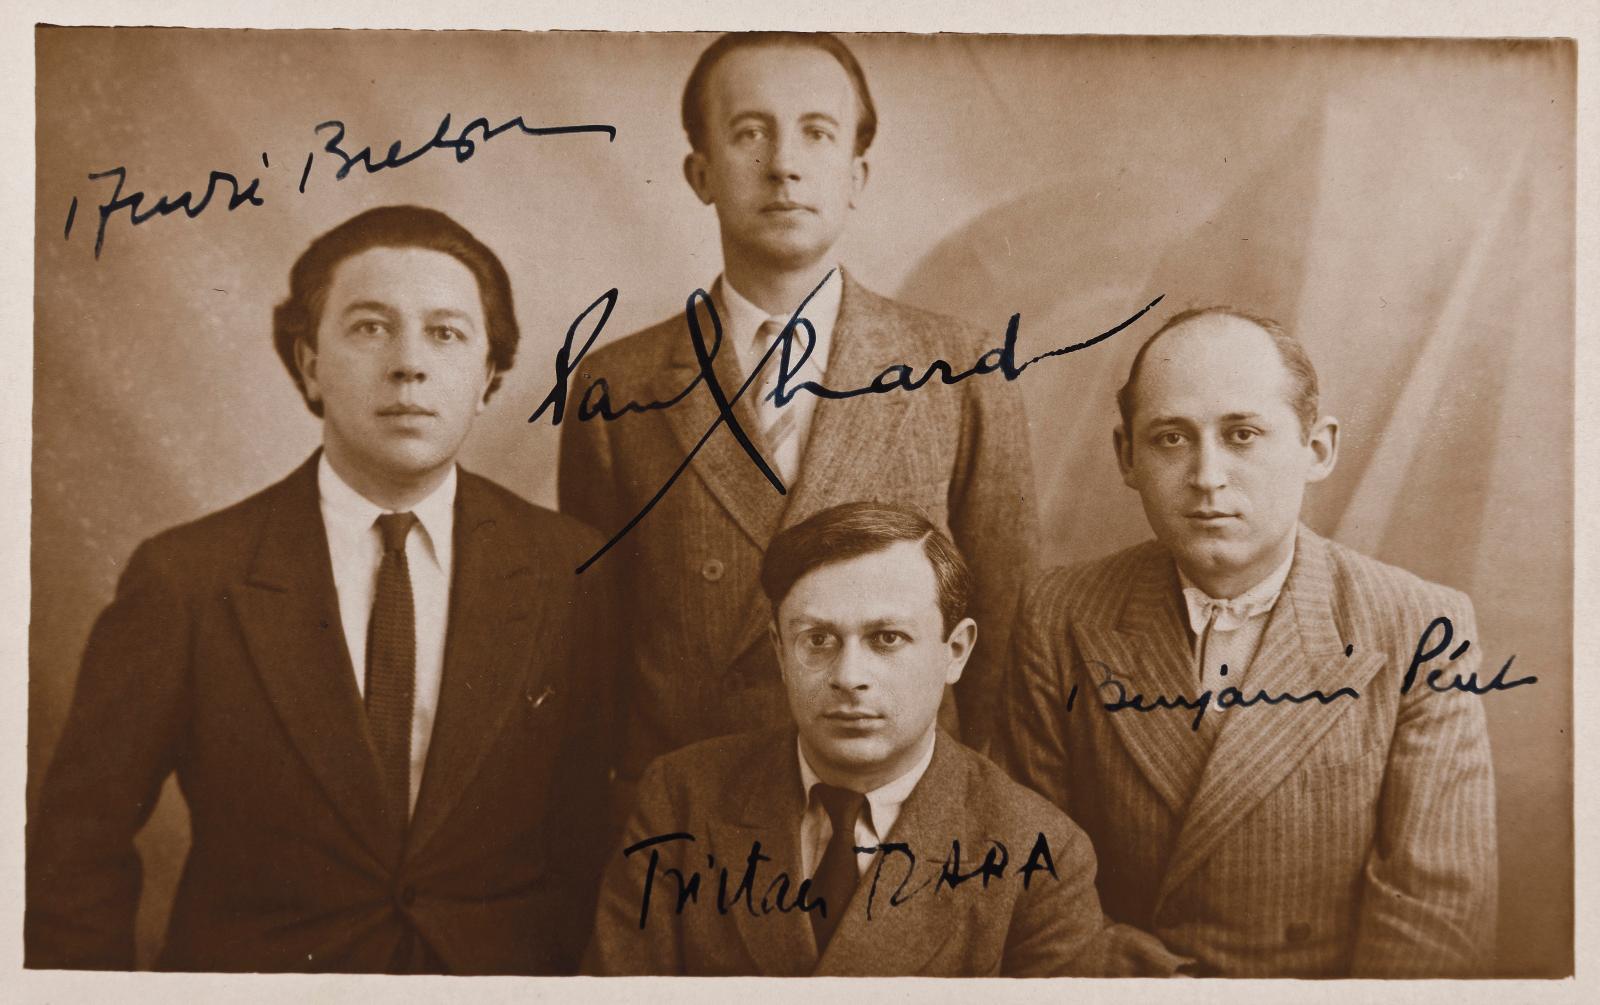 Original photograph, c. 1921, original period print on postcard showing André Breton, Paul Éluard, Tristan Tzara and Benjamin Péret, signed by the fou